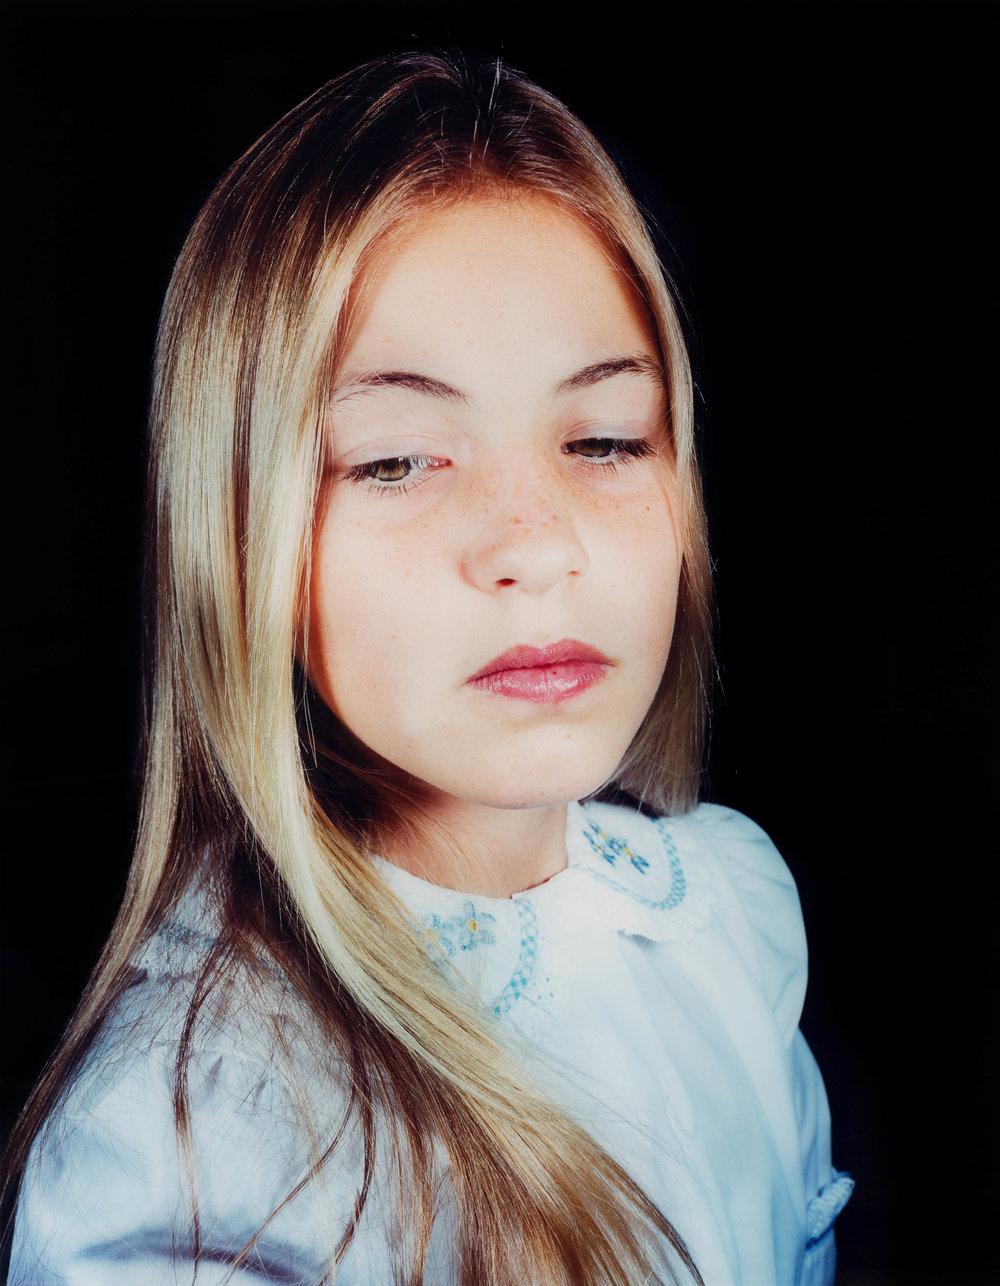 Anna Gaskell